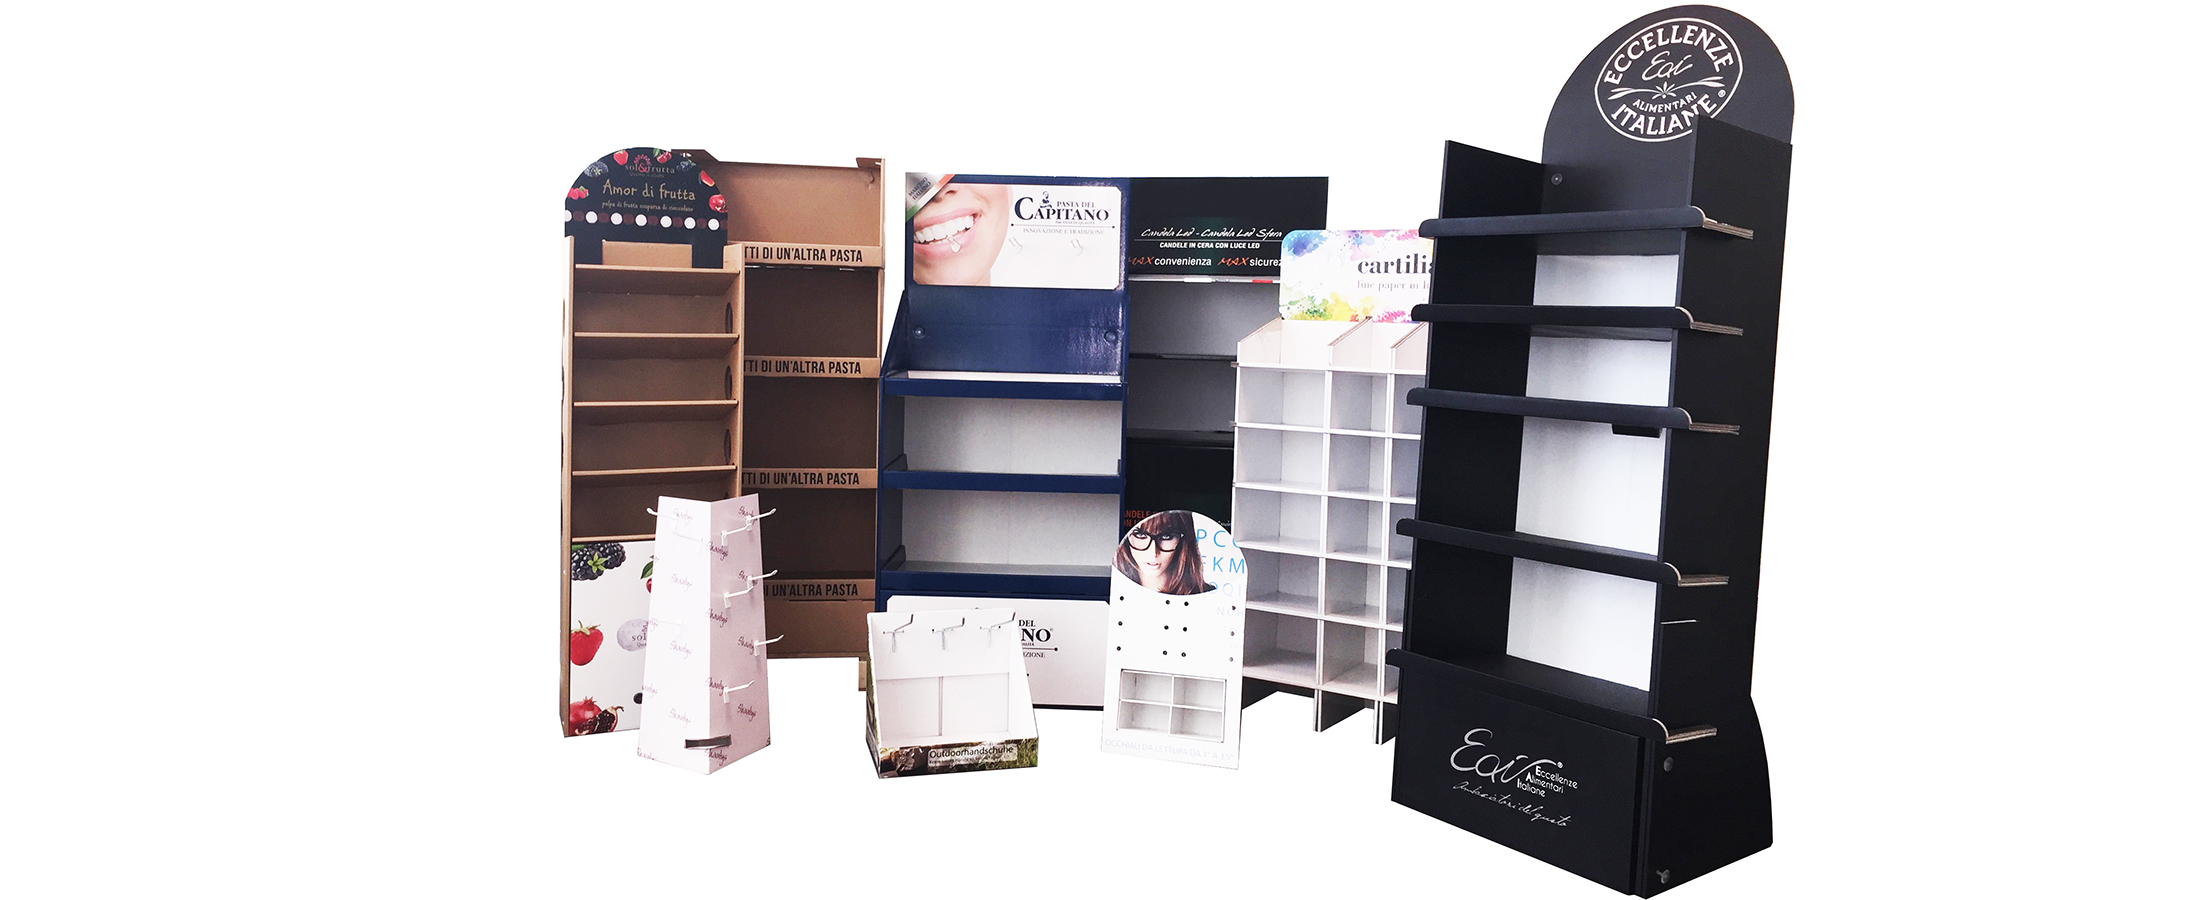 lampa_packaging_espositori_2200x900